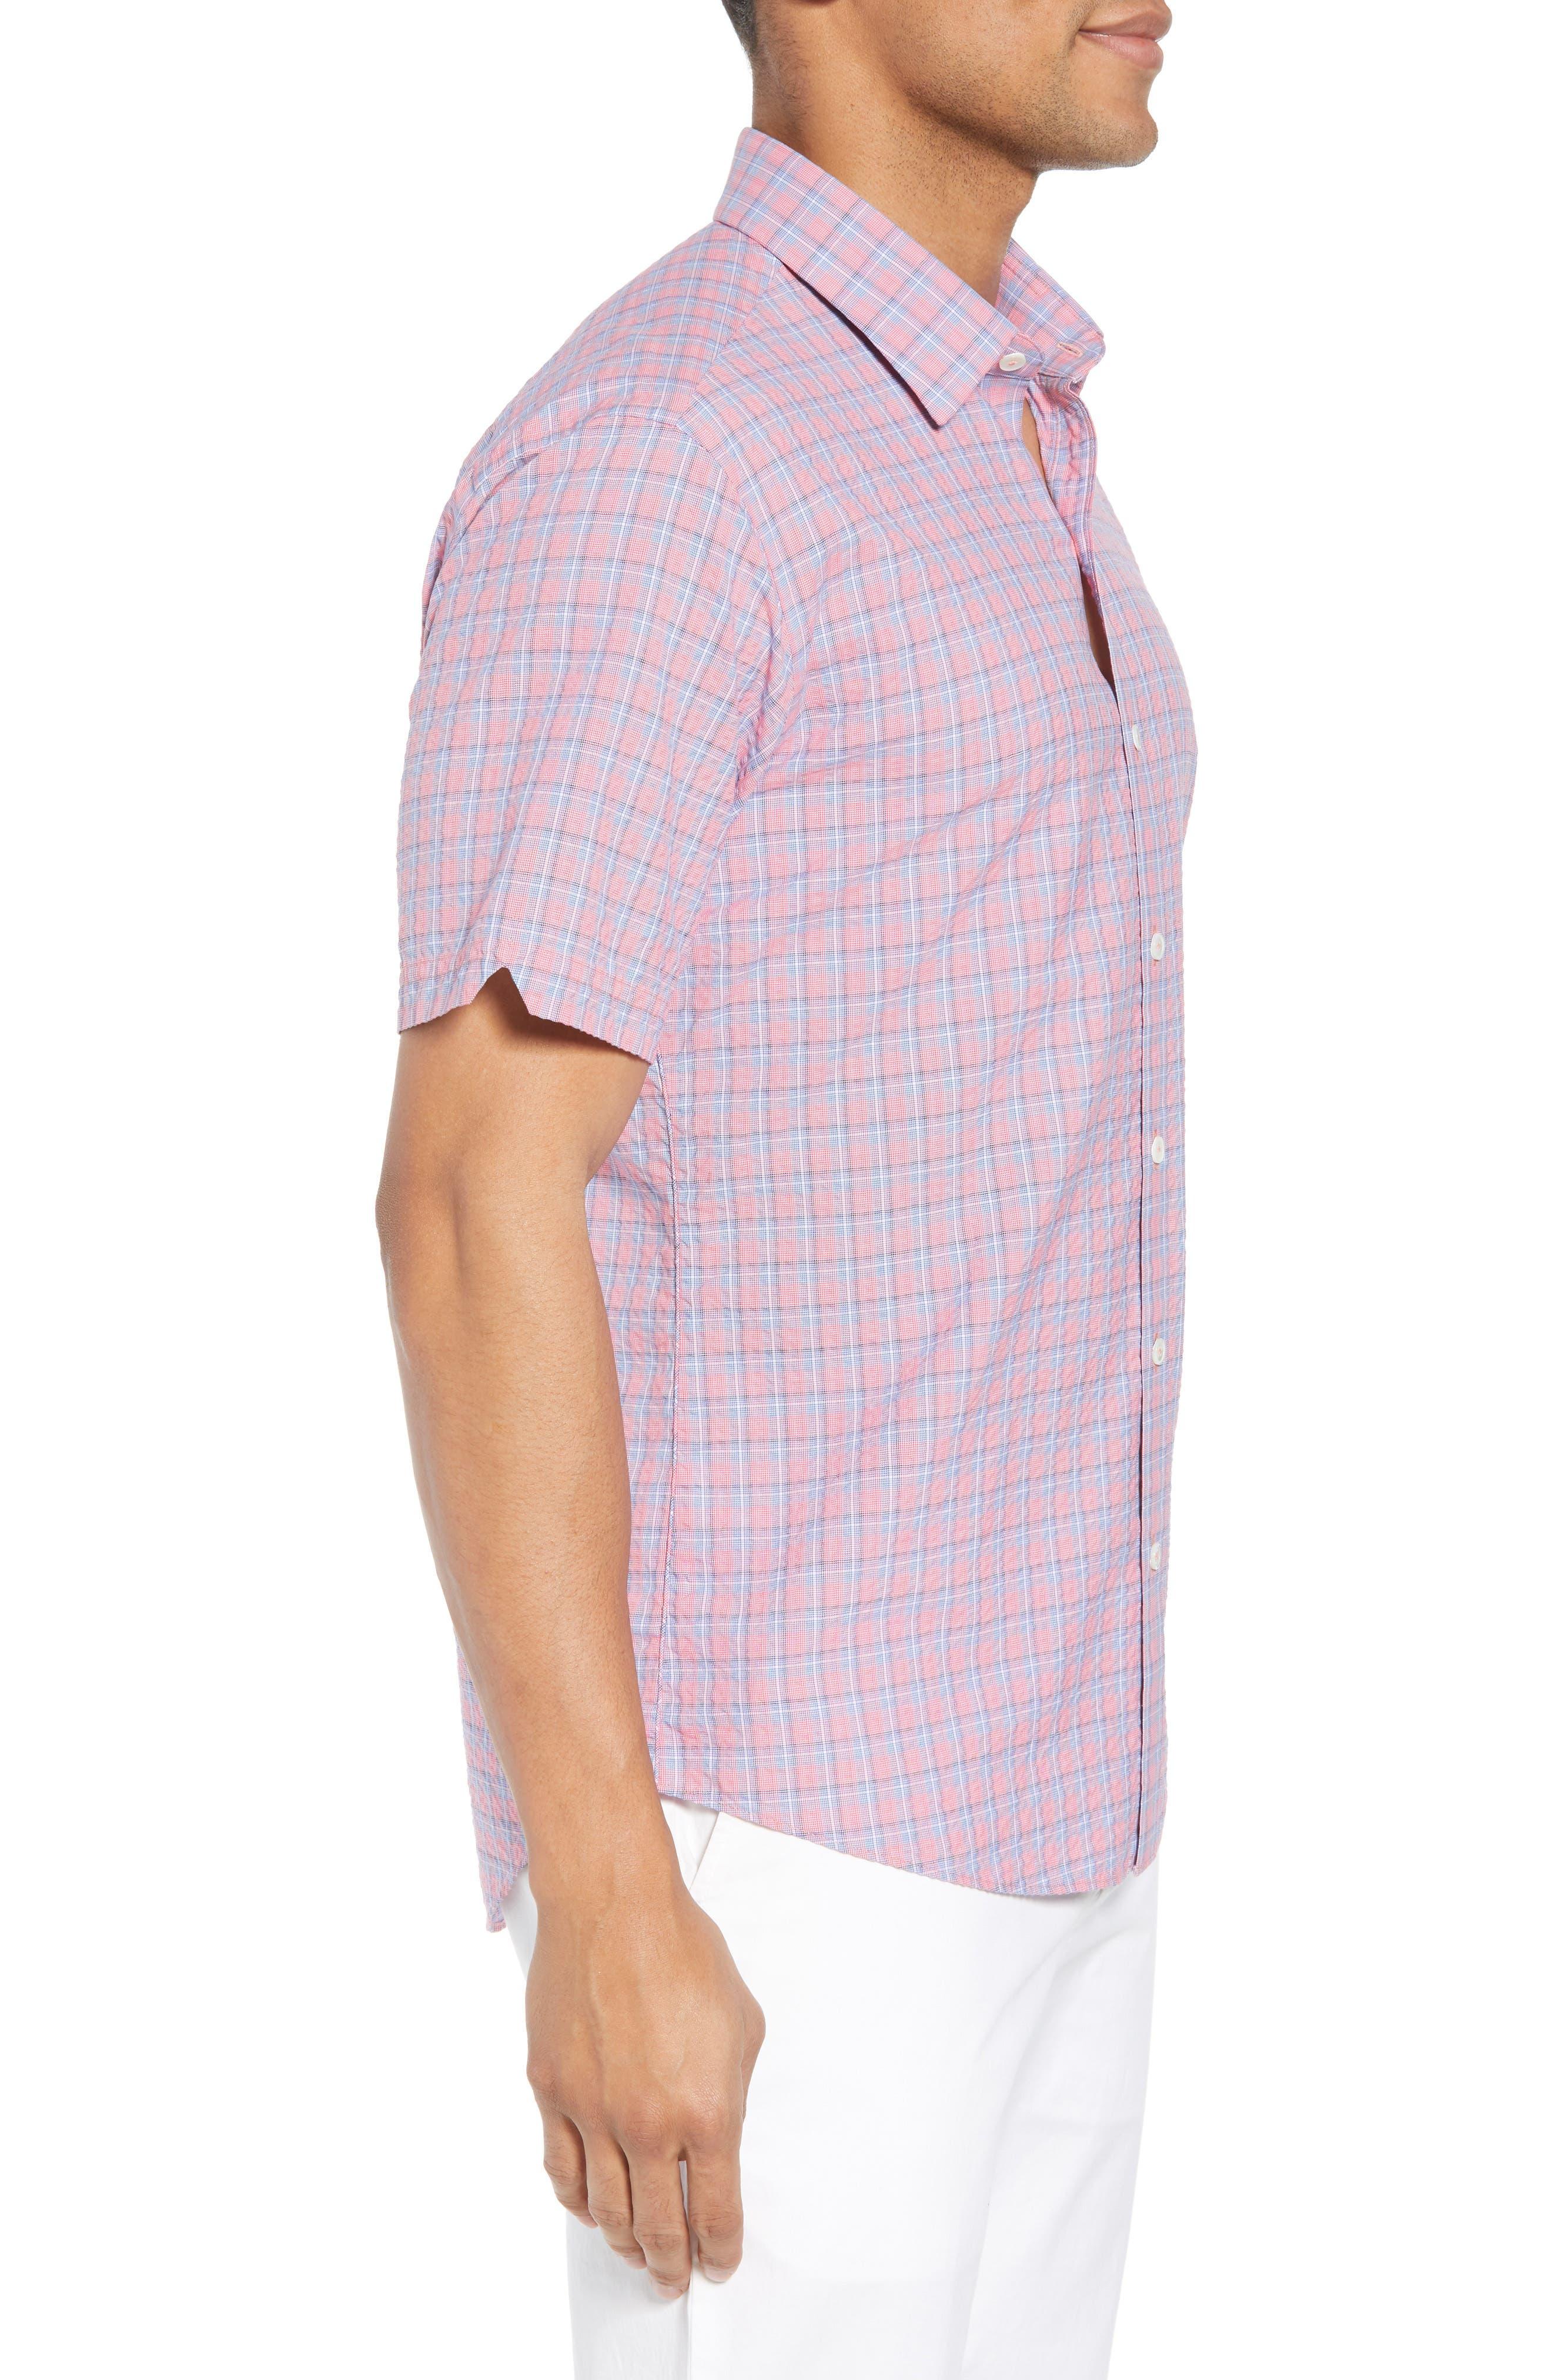 Luna Trim Fit Seersucker Sport Shirt,                             Alternate thumbnail 3, color,                             632